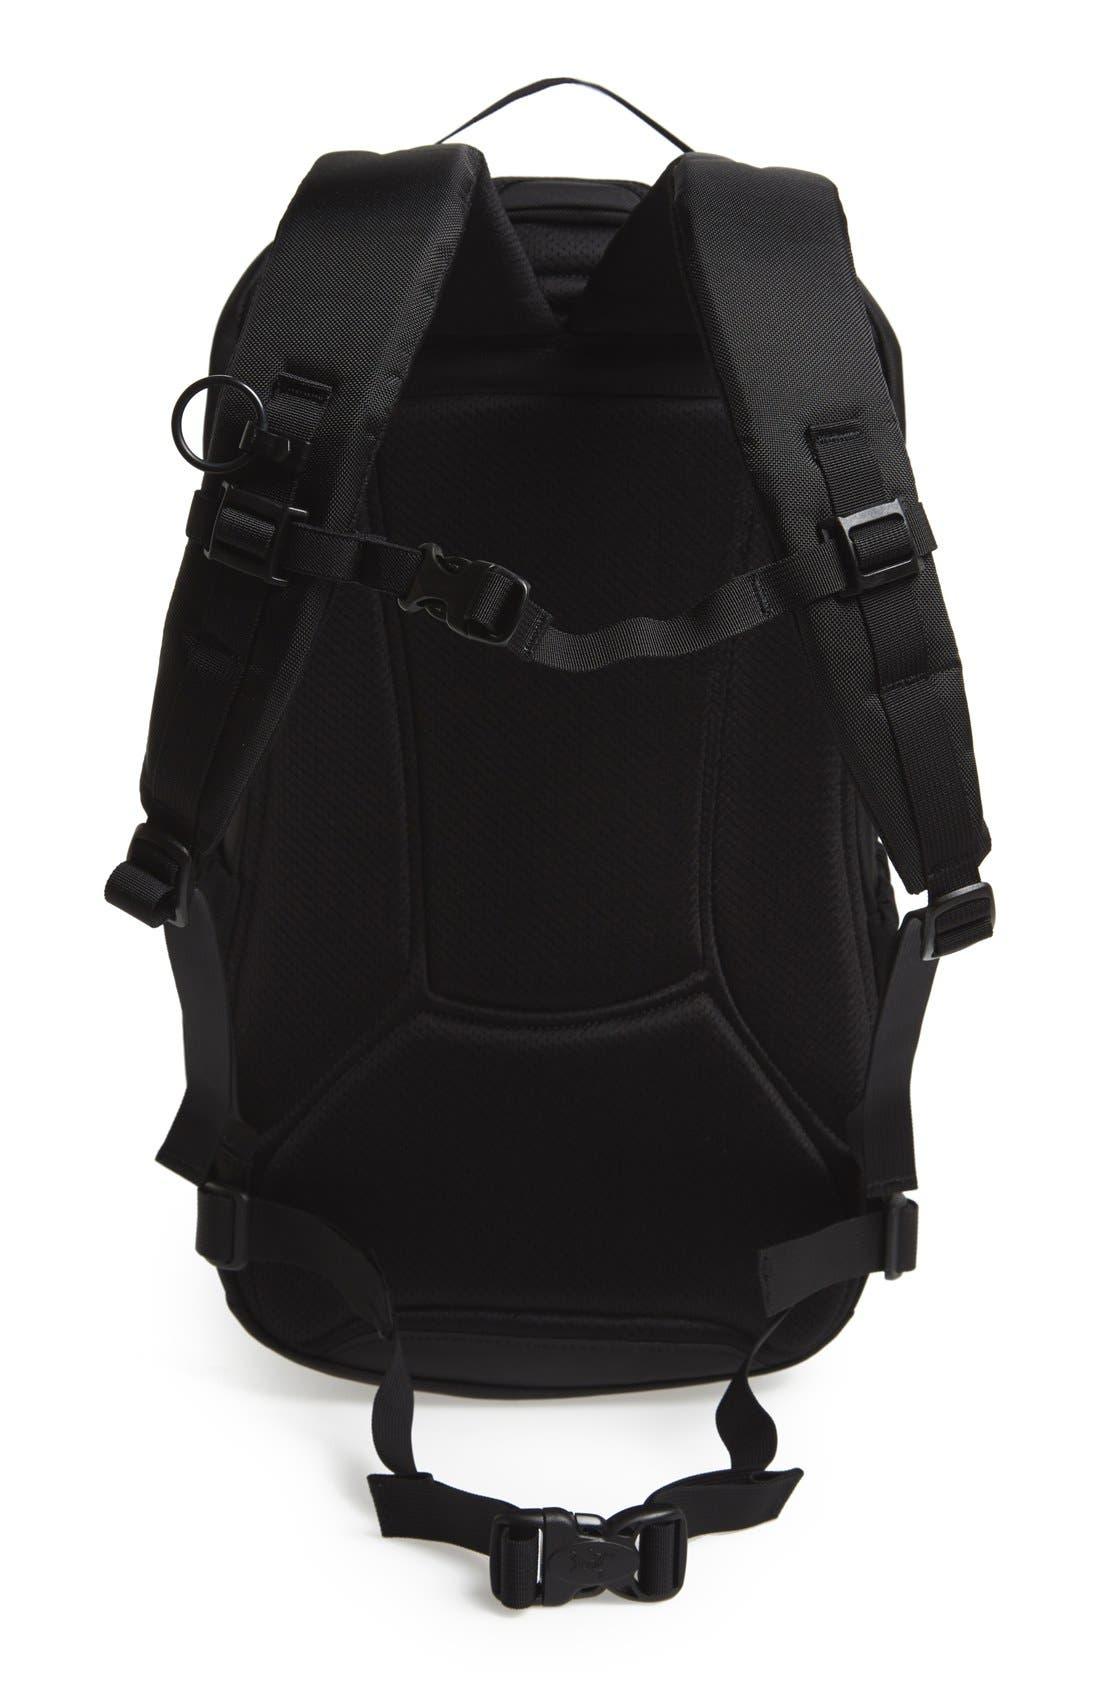 ARC'TERYX,                             'Mantis 26L' Backpack,                             Alternate thumbnail 2, color,                             001